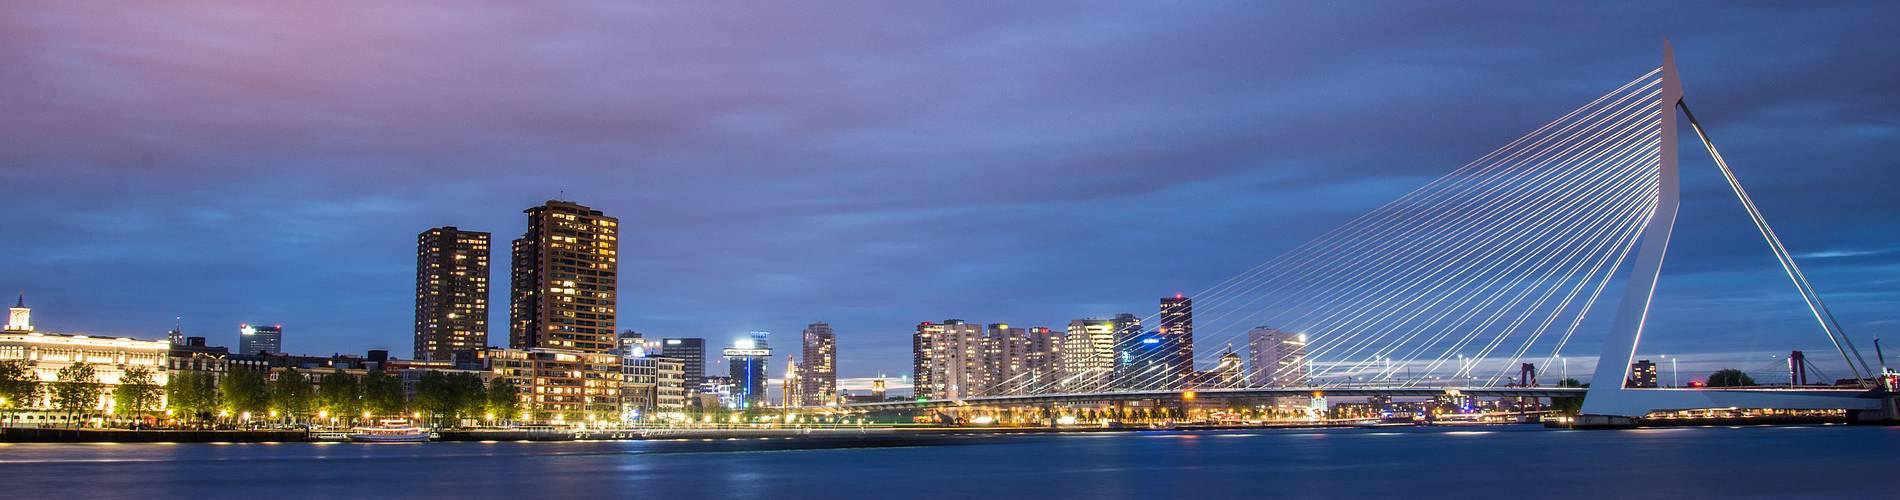 Rotterdam 1900x500